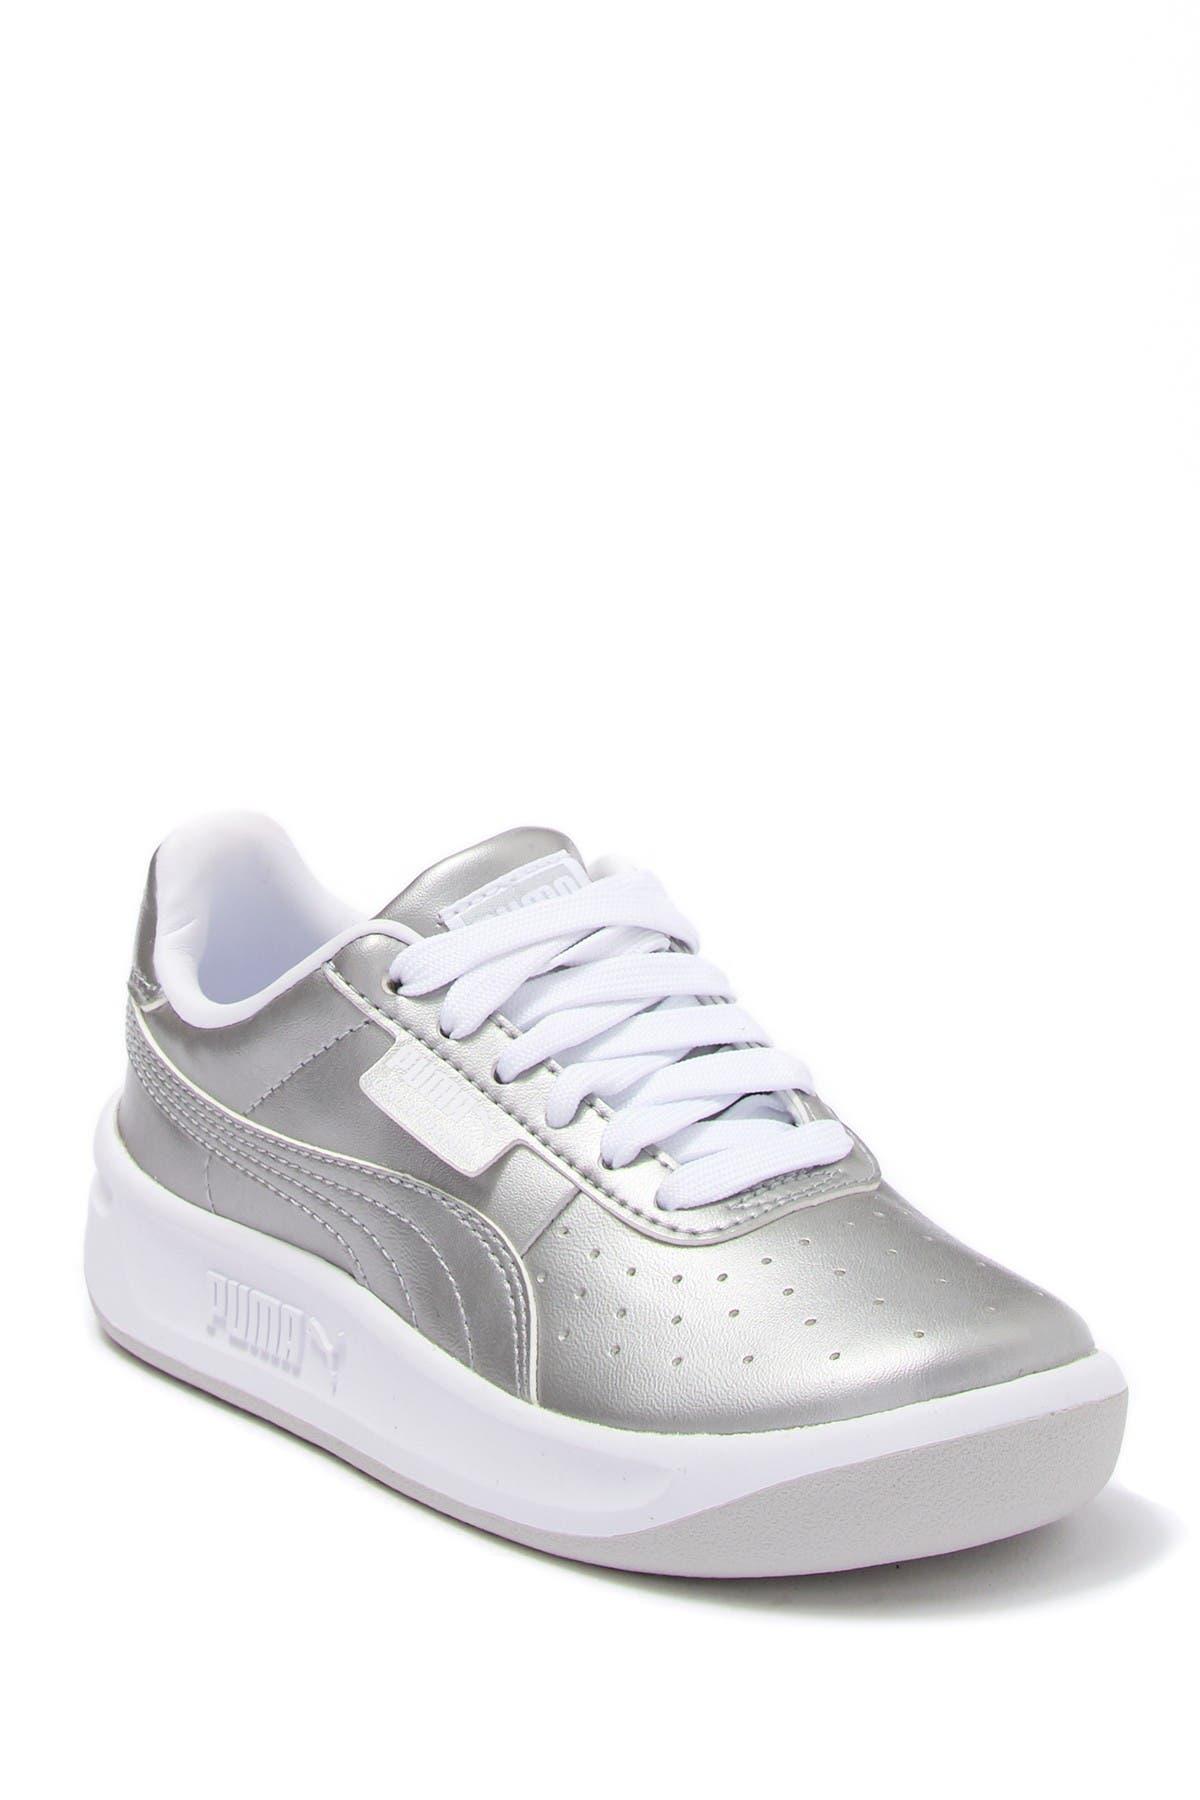 PUMA | California Metallic Sneaker